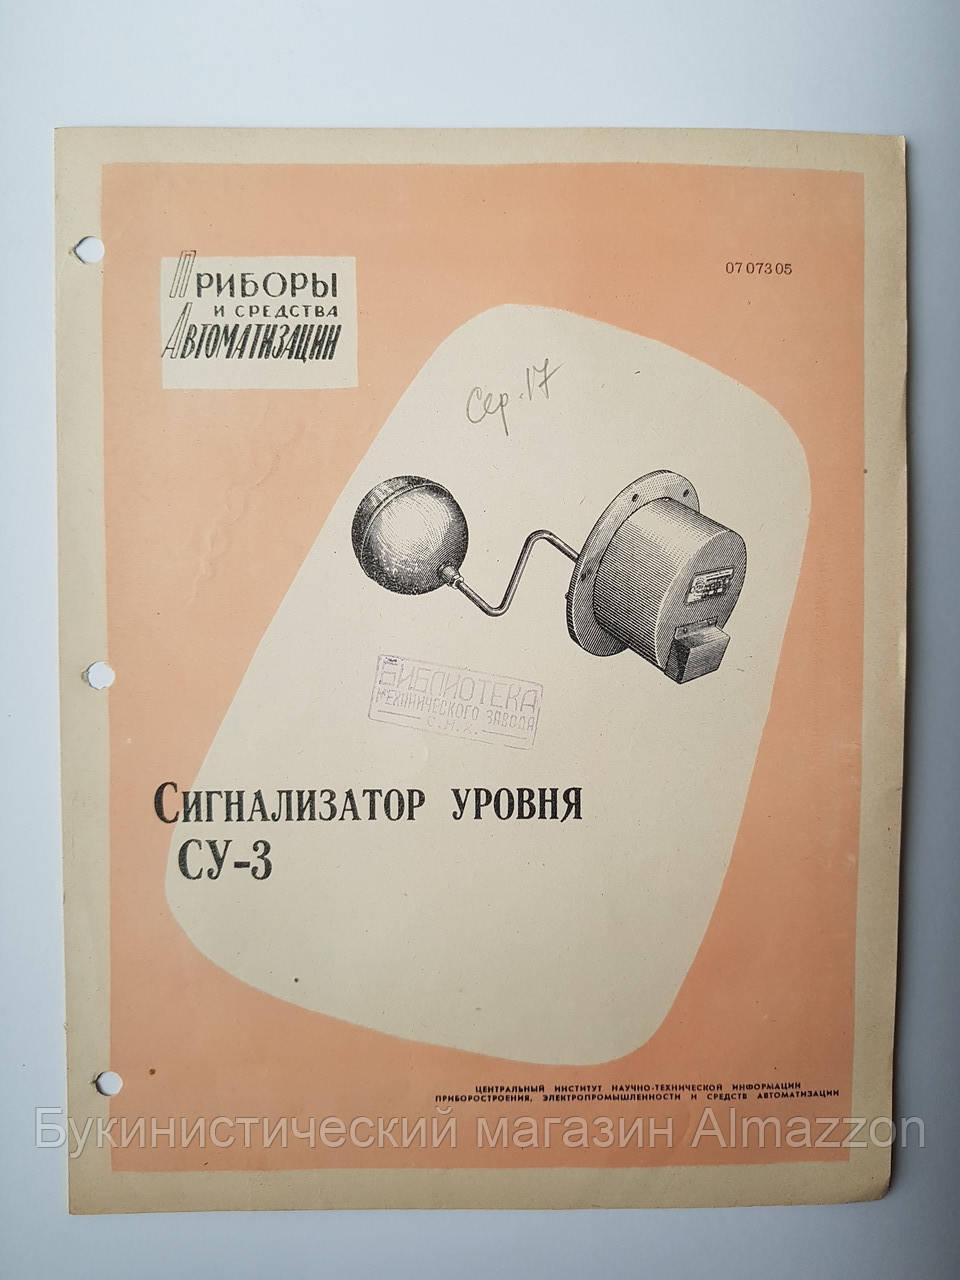 "Журнал (Бюллетень) ""Сигнализатор уровня СУ-3  07073.05"" 1962 г., фото 1"